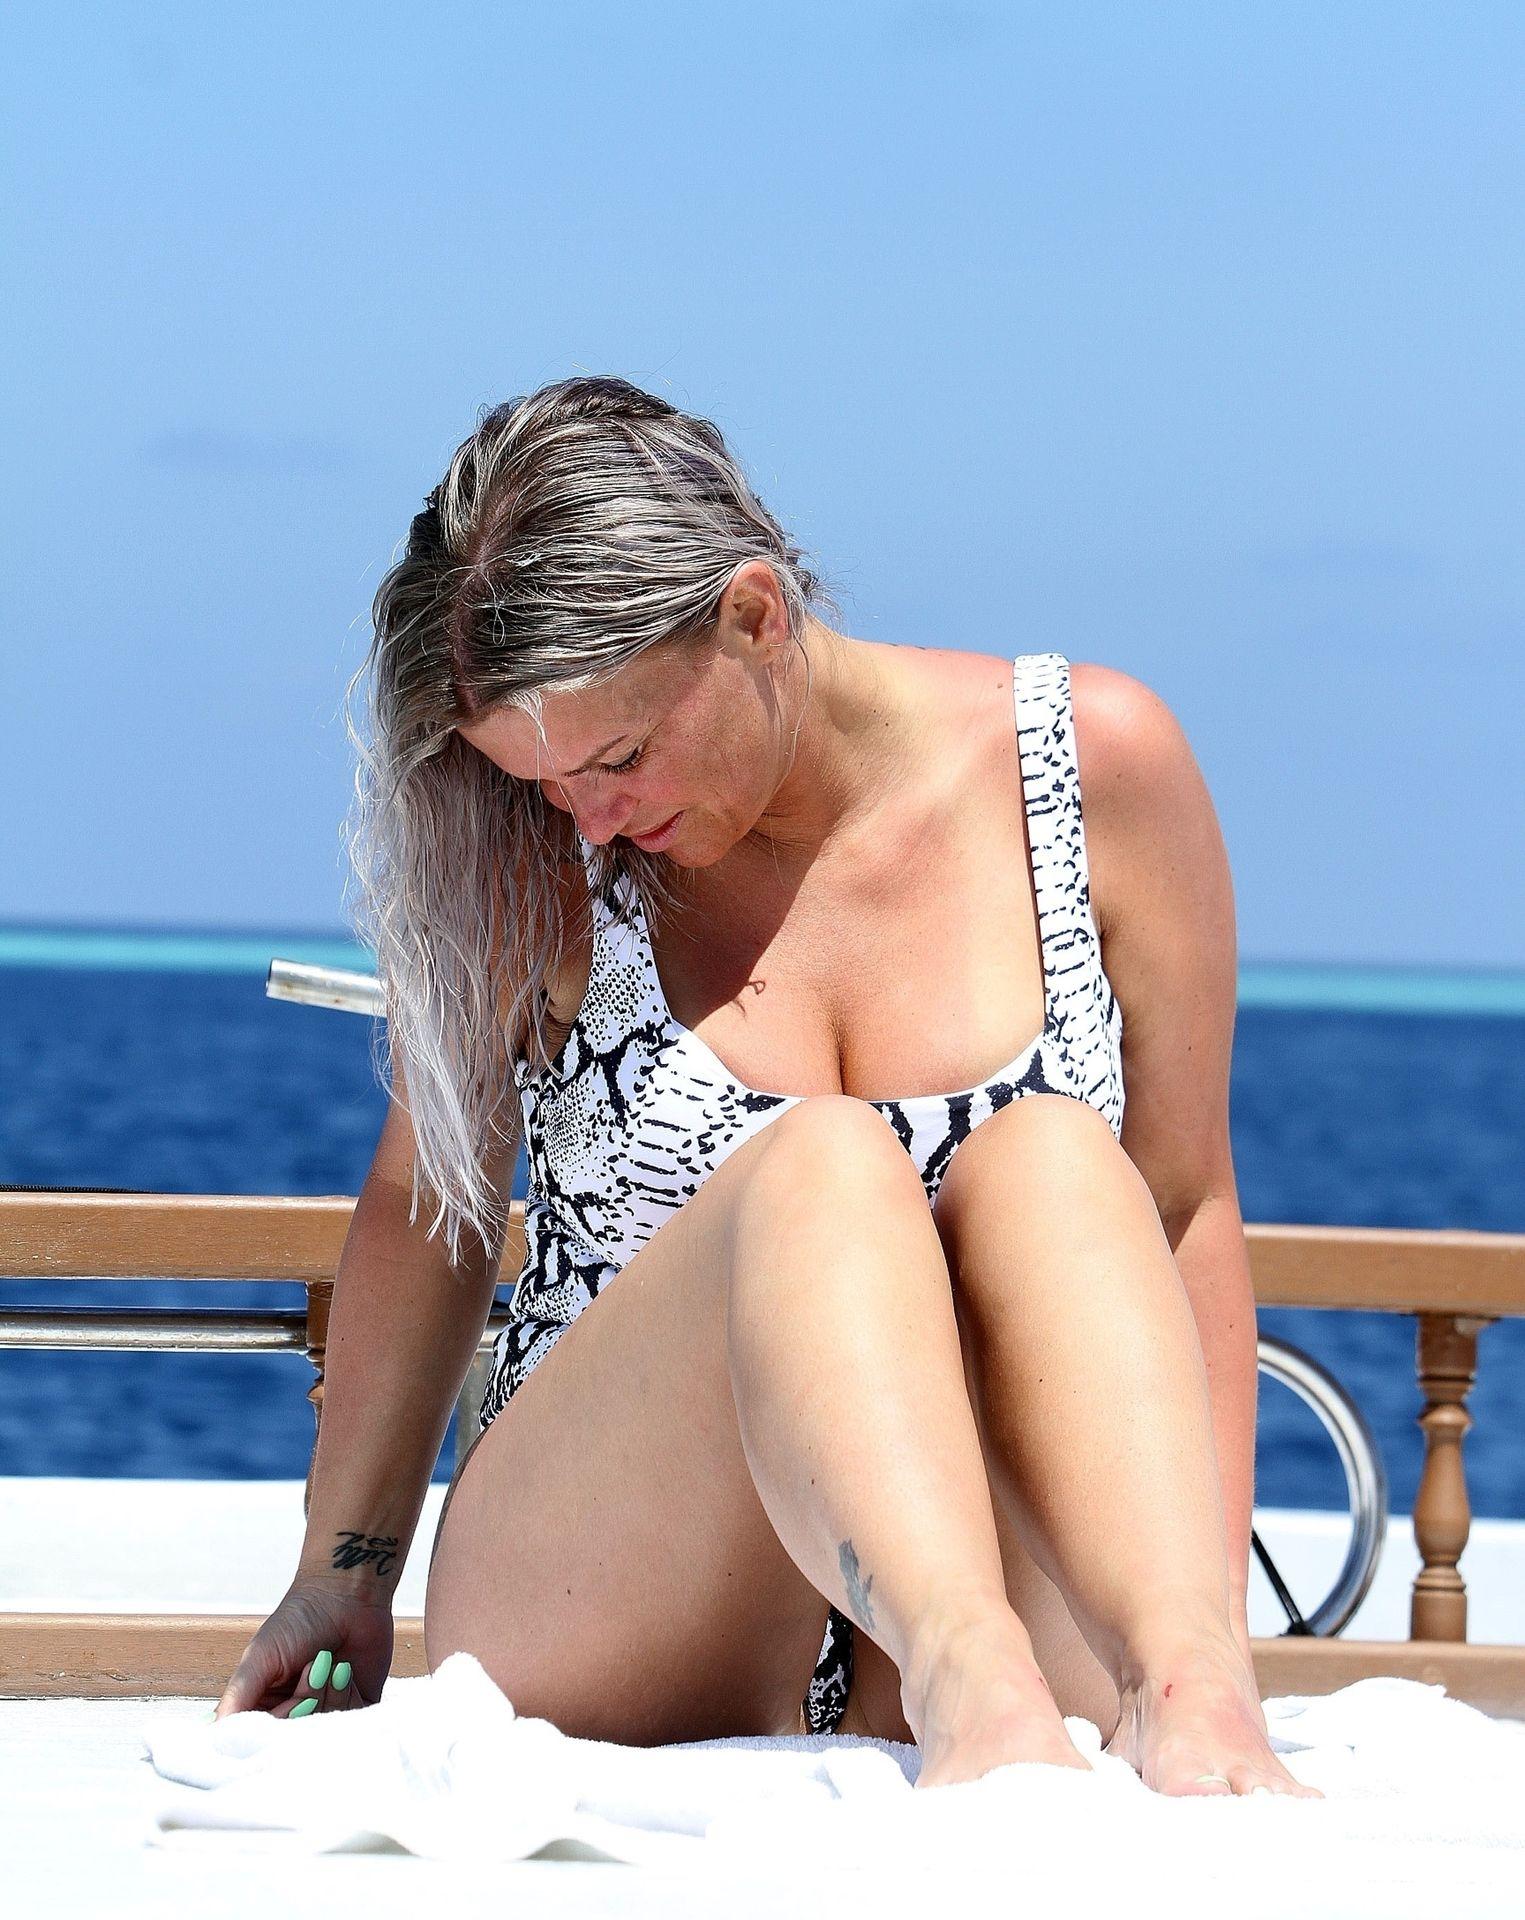 Kerry Katona & Ryan Mahoney Hit The Beach On Holiday At Their Luxury 5 Star Resort Ayada Maldives 0042